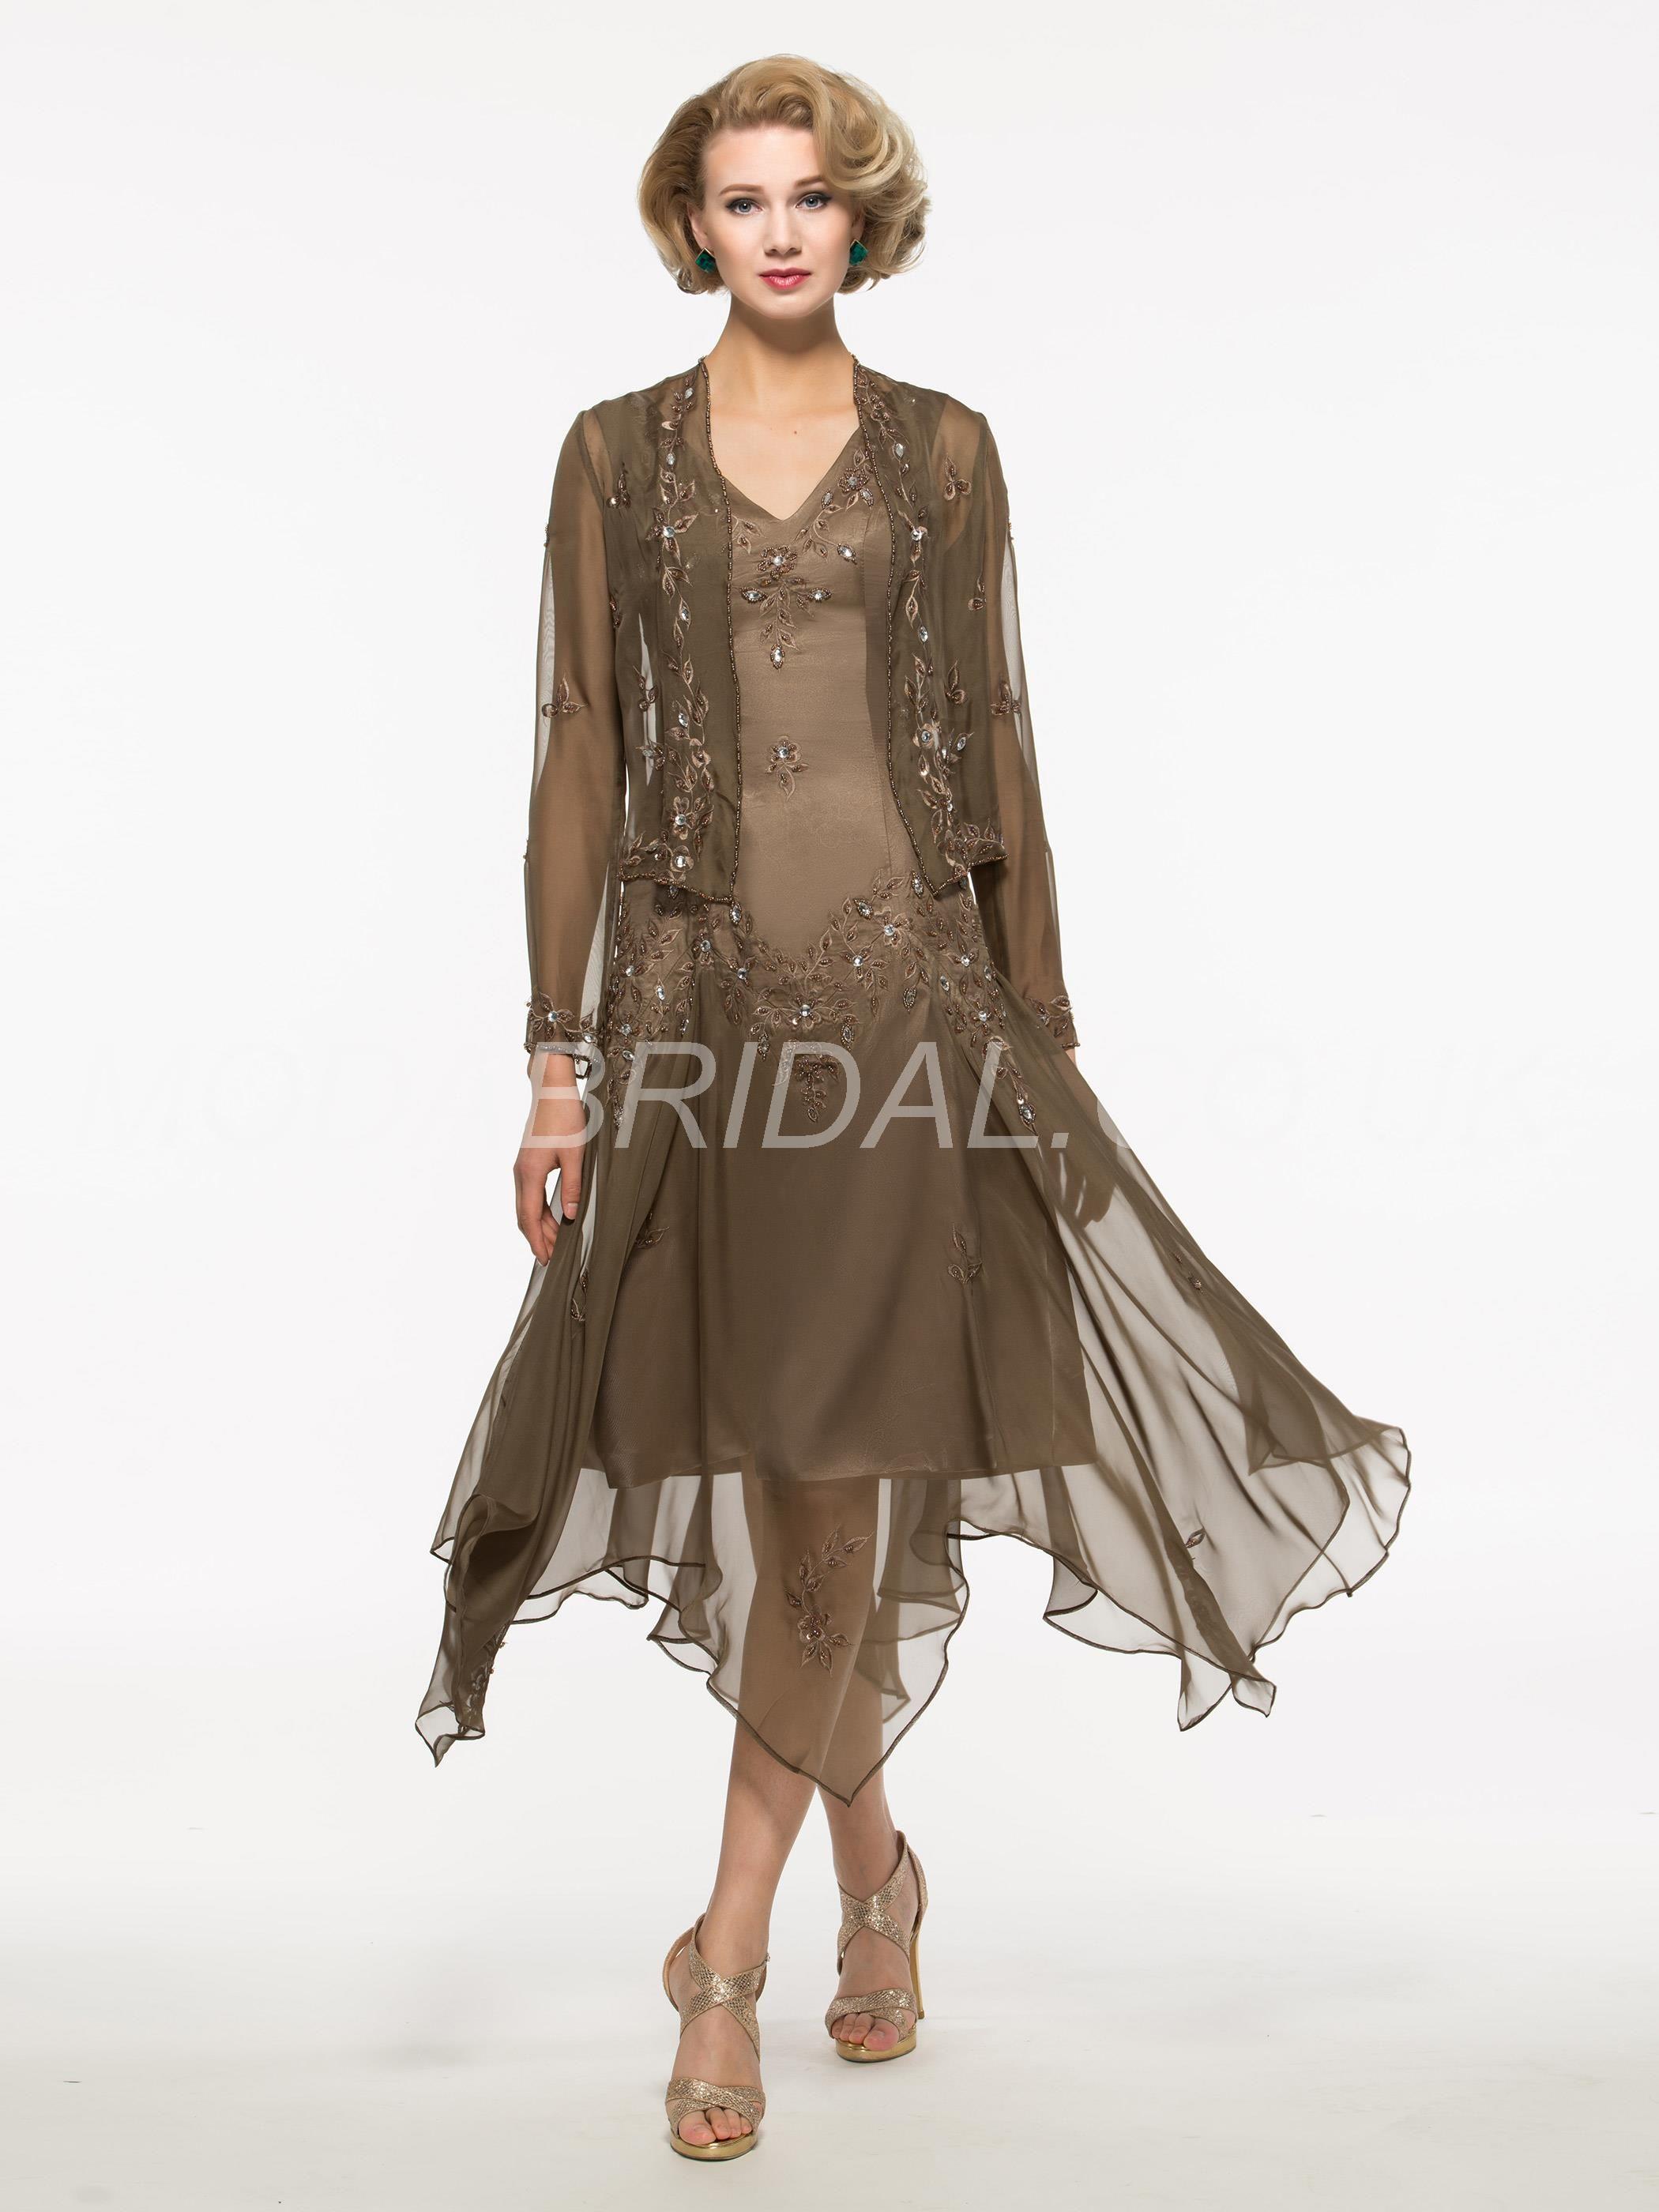 Modabridal Co Uk Supplies Vogue Fall A Line Spring Sequins Zipper Up Classic Timeless Sleeveless Winter Dress Lates Mothers Dresses Bride Clothes Groom Dress